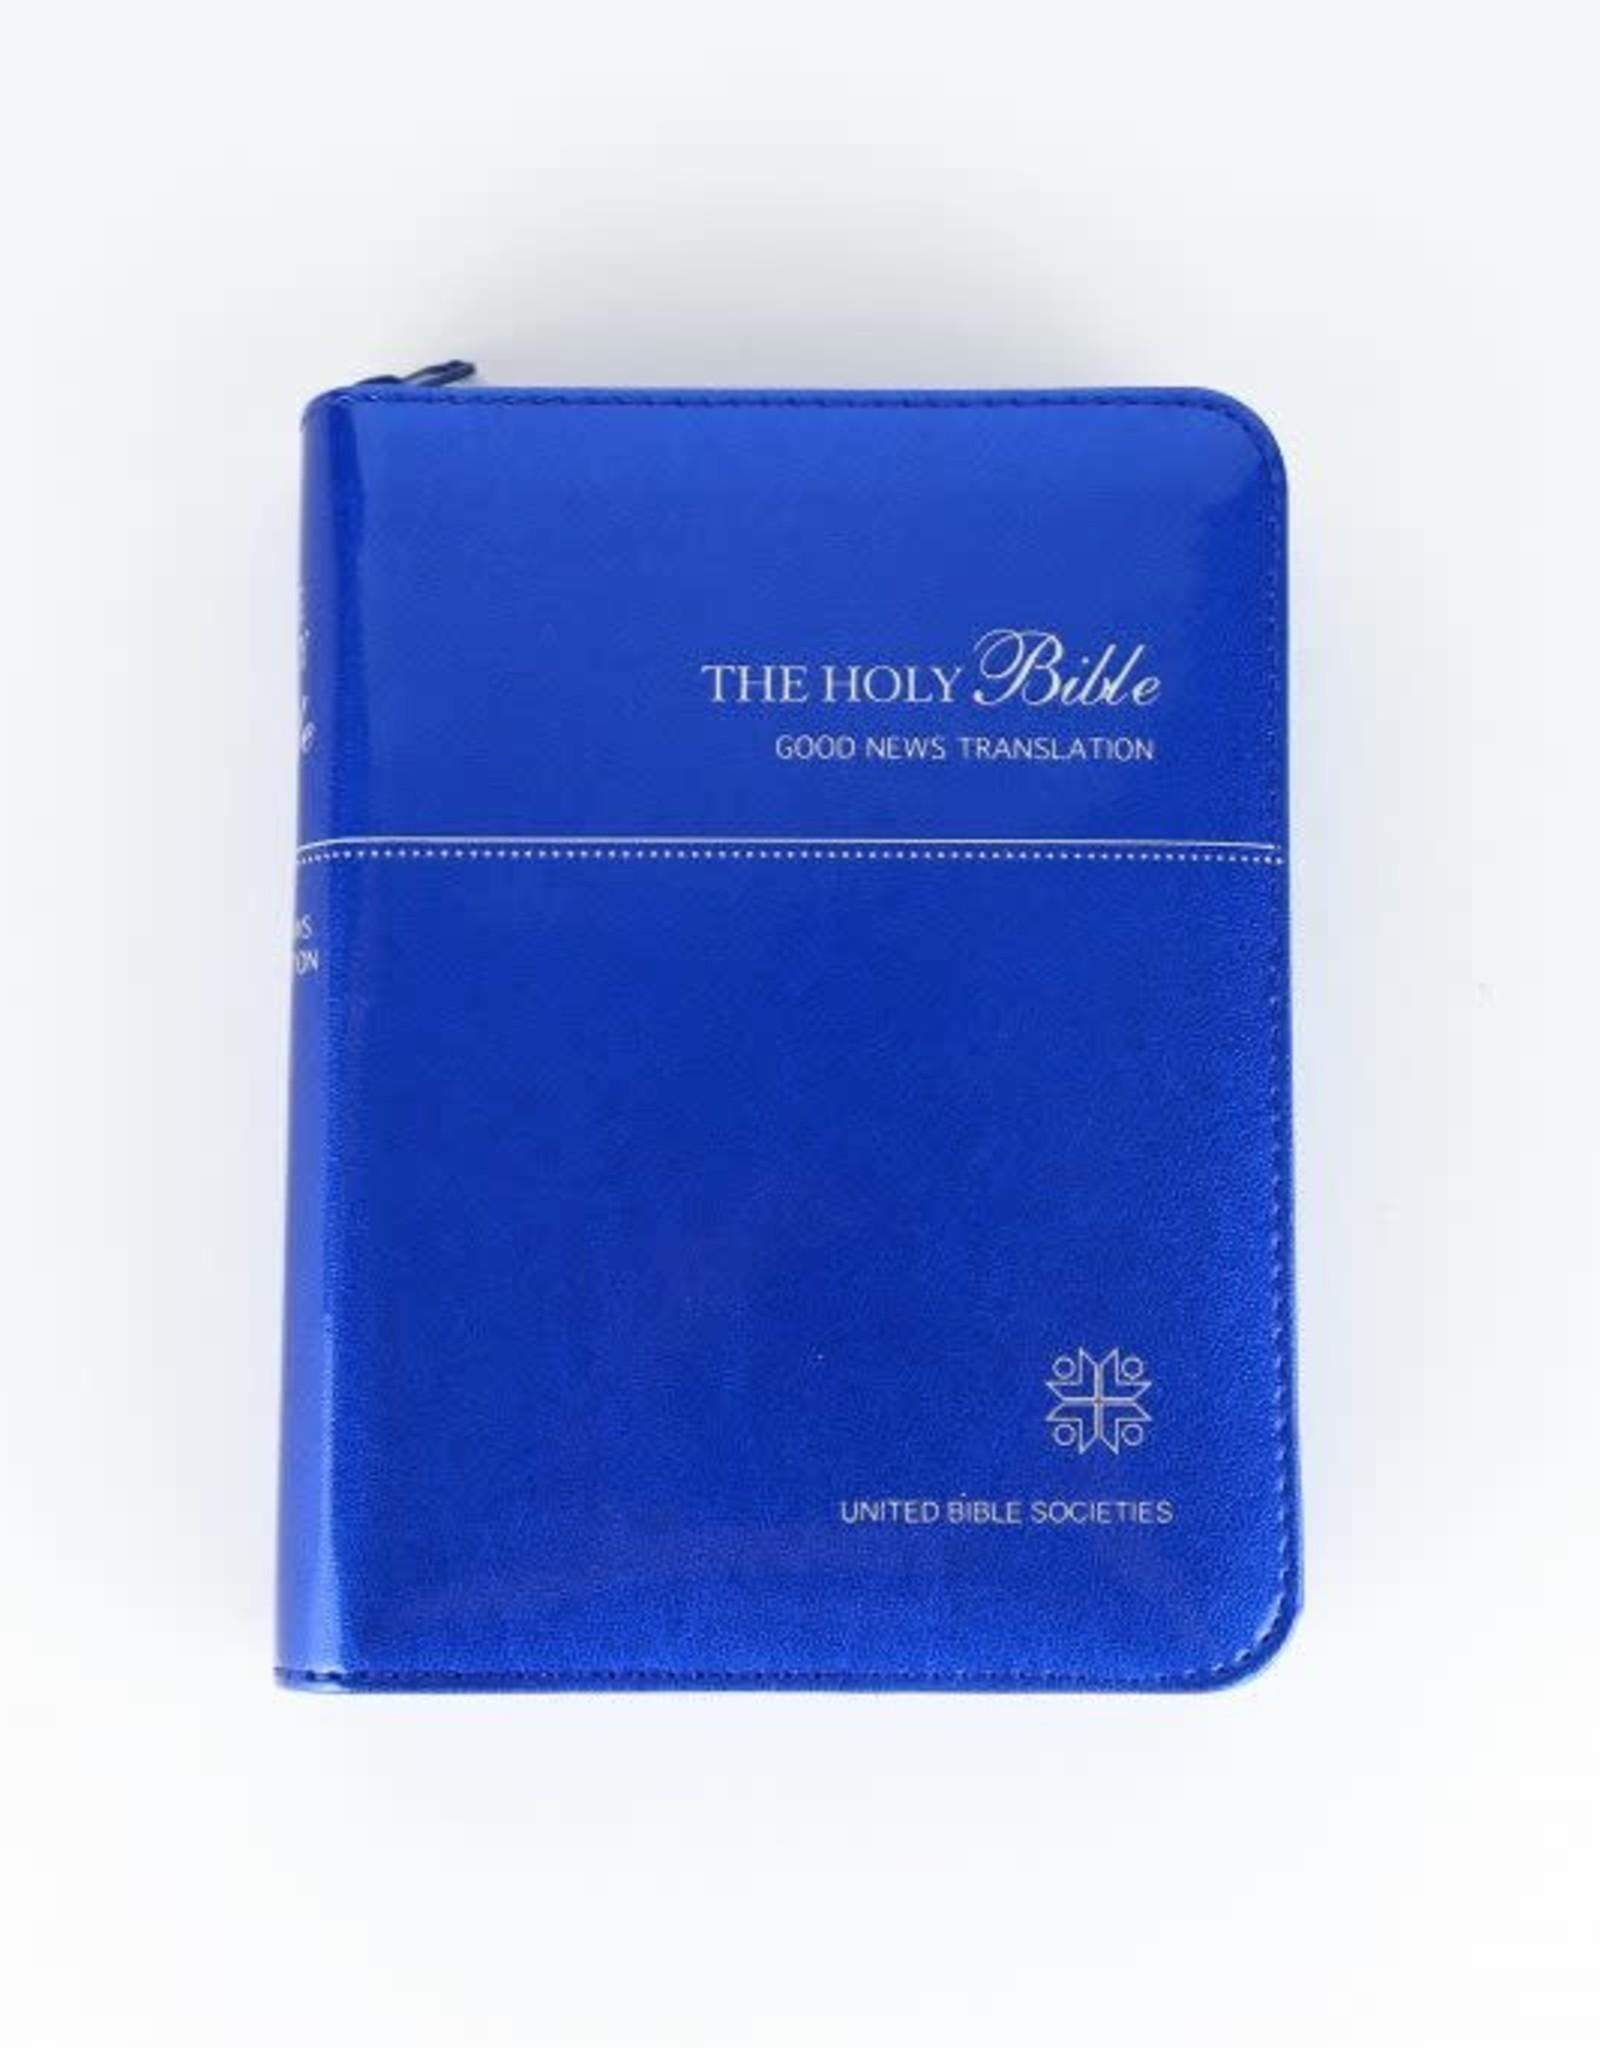 Société Biblique / Bible Society Holy Bible (blue cover)  Good News Translation